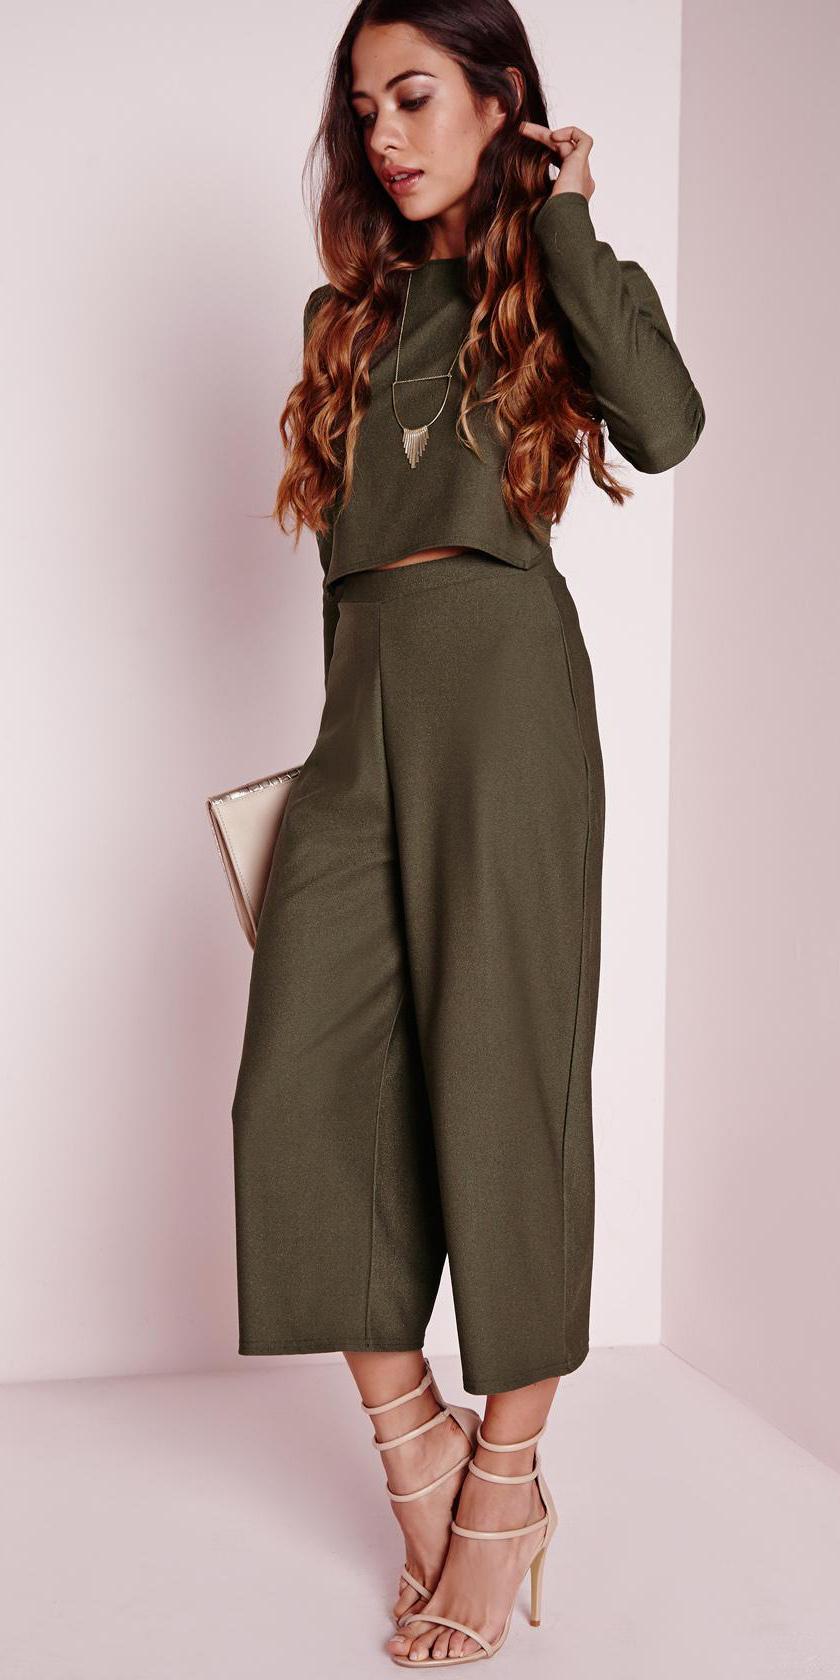 green-olive-culottes-pants-green-olive-top-matchset-necklace-tan-shoe-sandalh-spring-summer-hairr-dinner.jpg